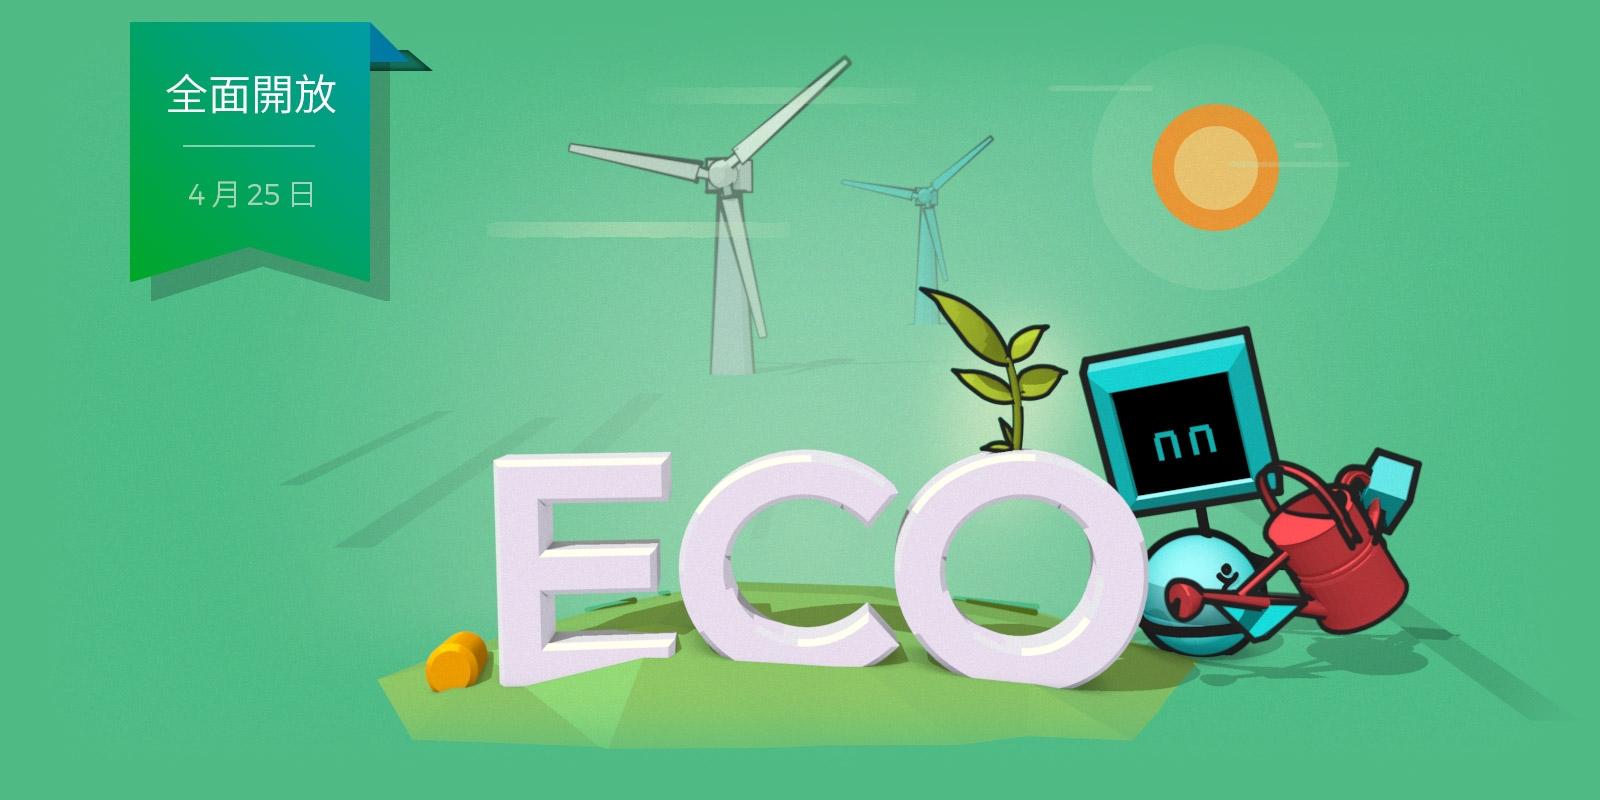 .eco 域名全面開放註冊